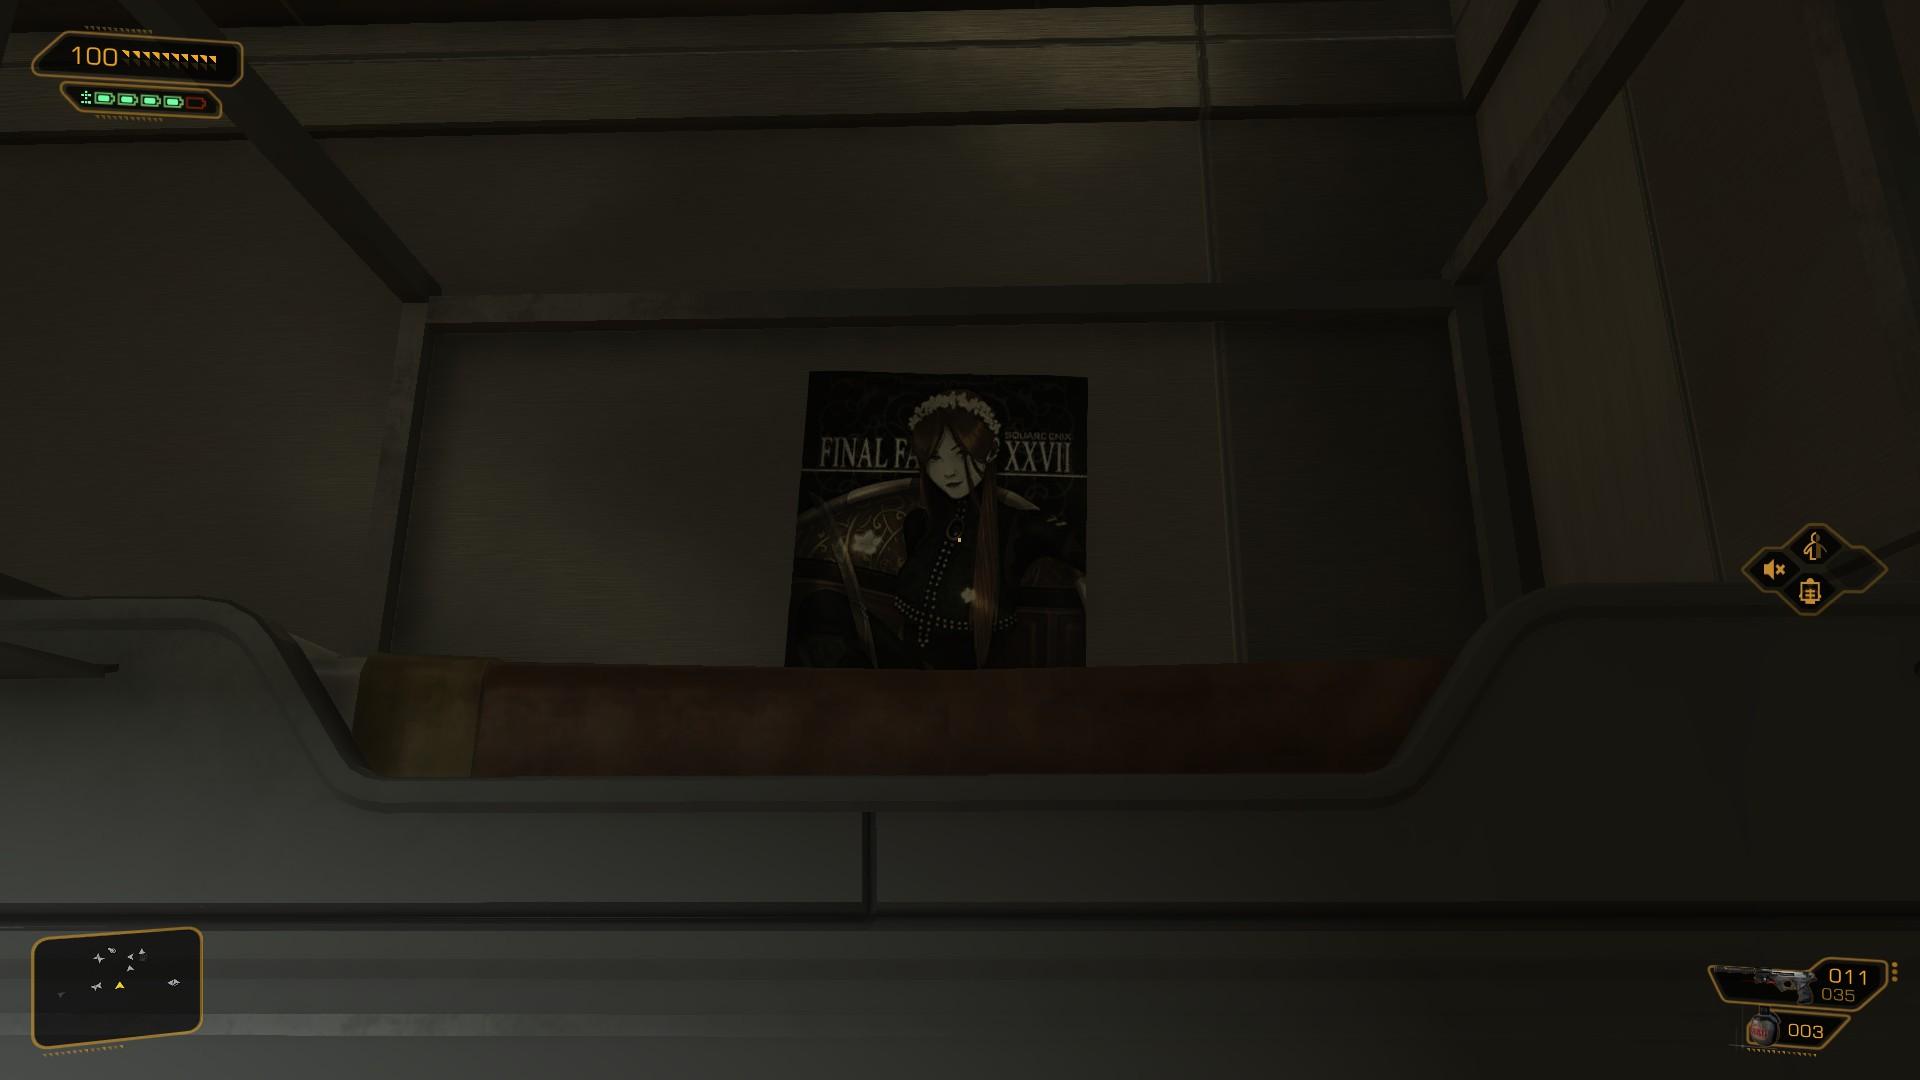 Deus Ex: Human Revolution . I laughed.